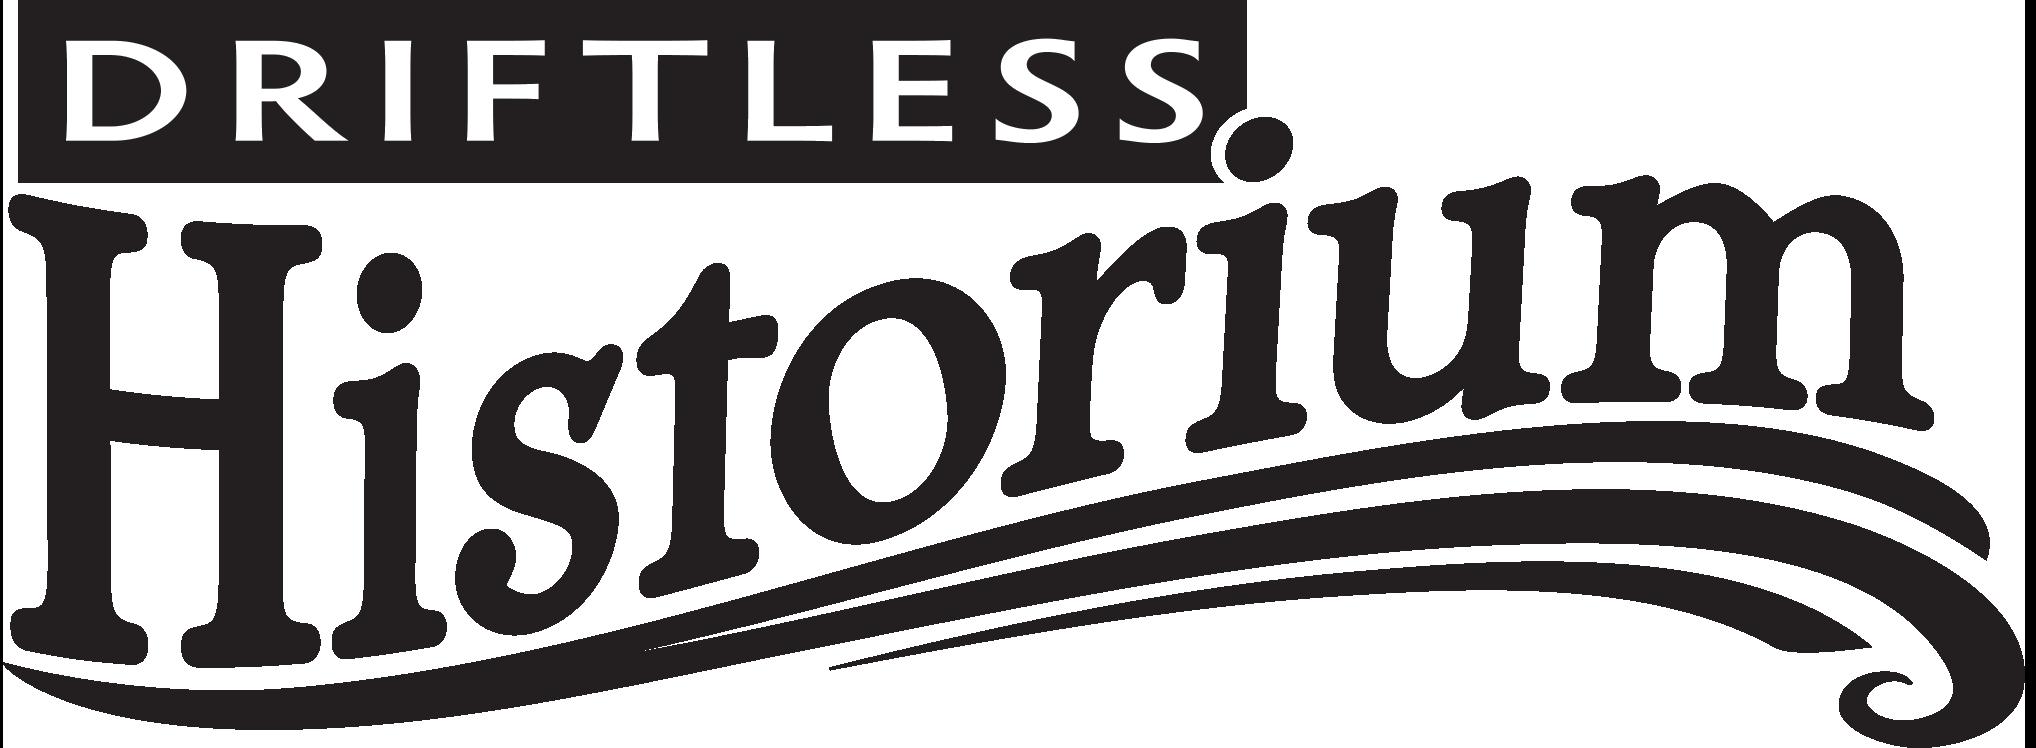 Driftless Historium logo